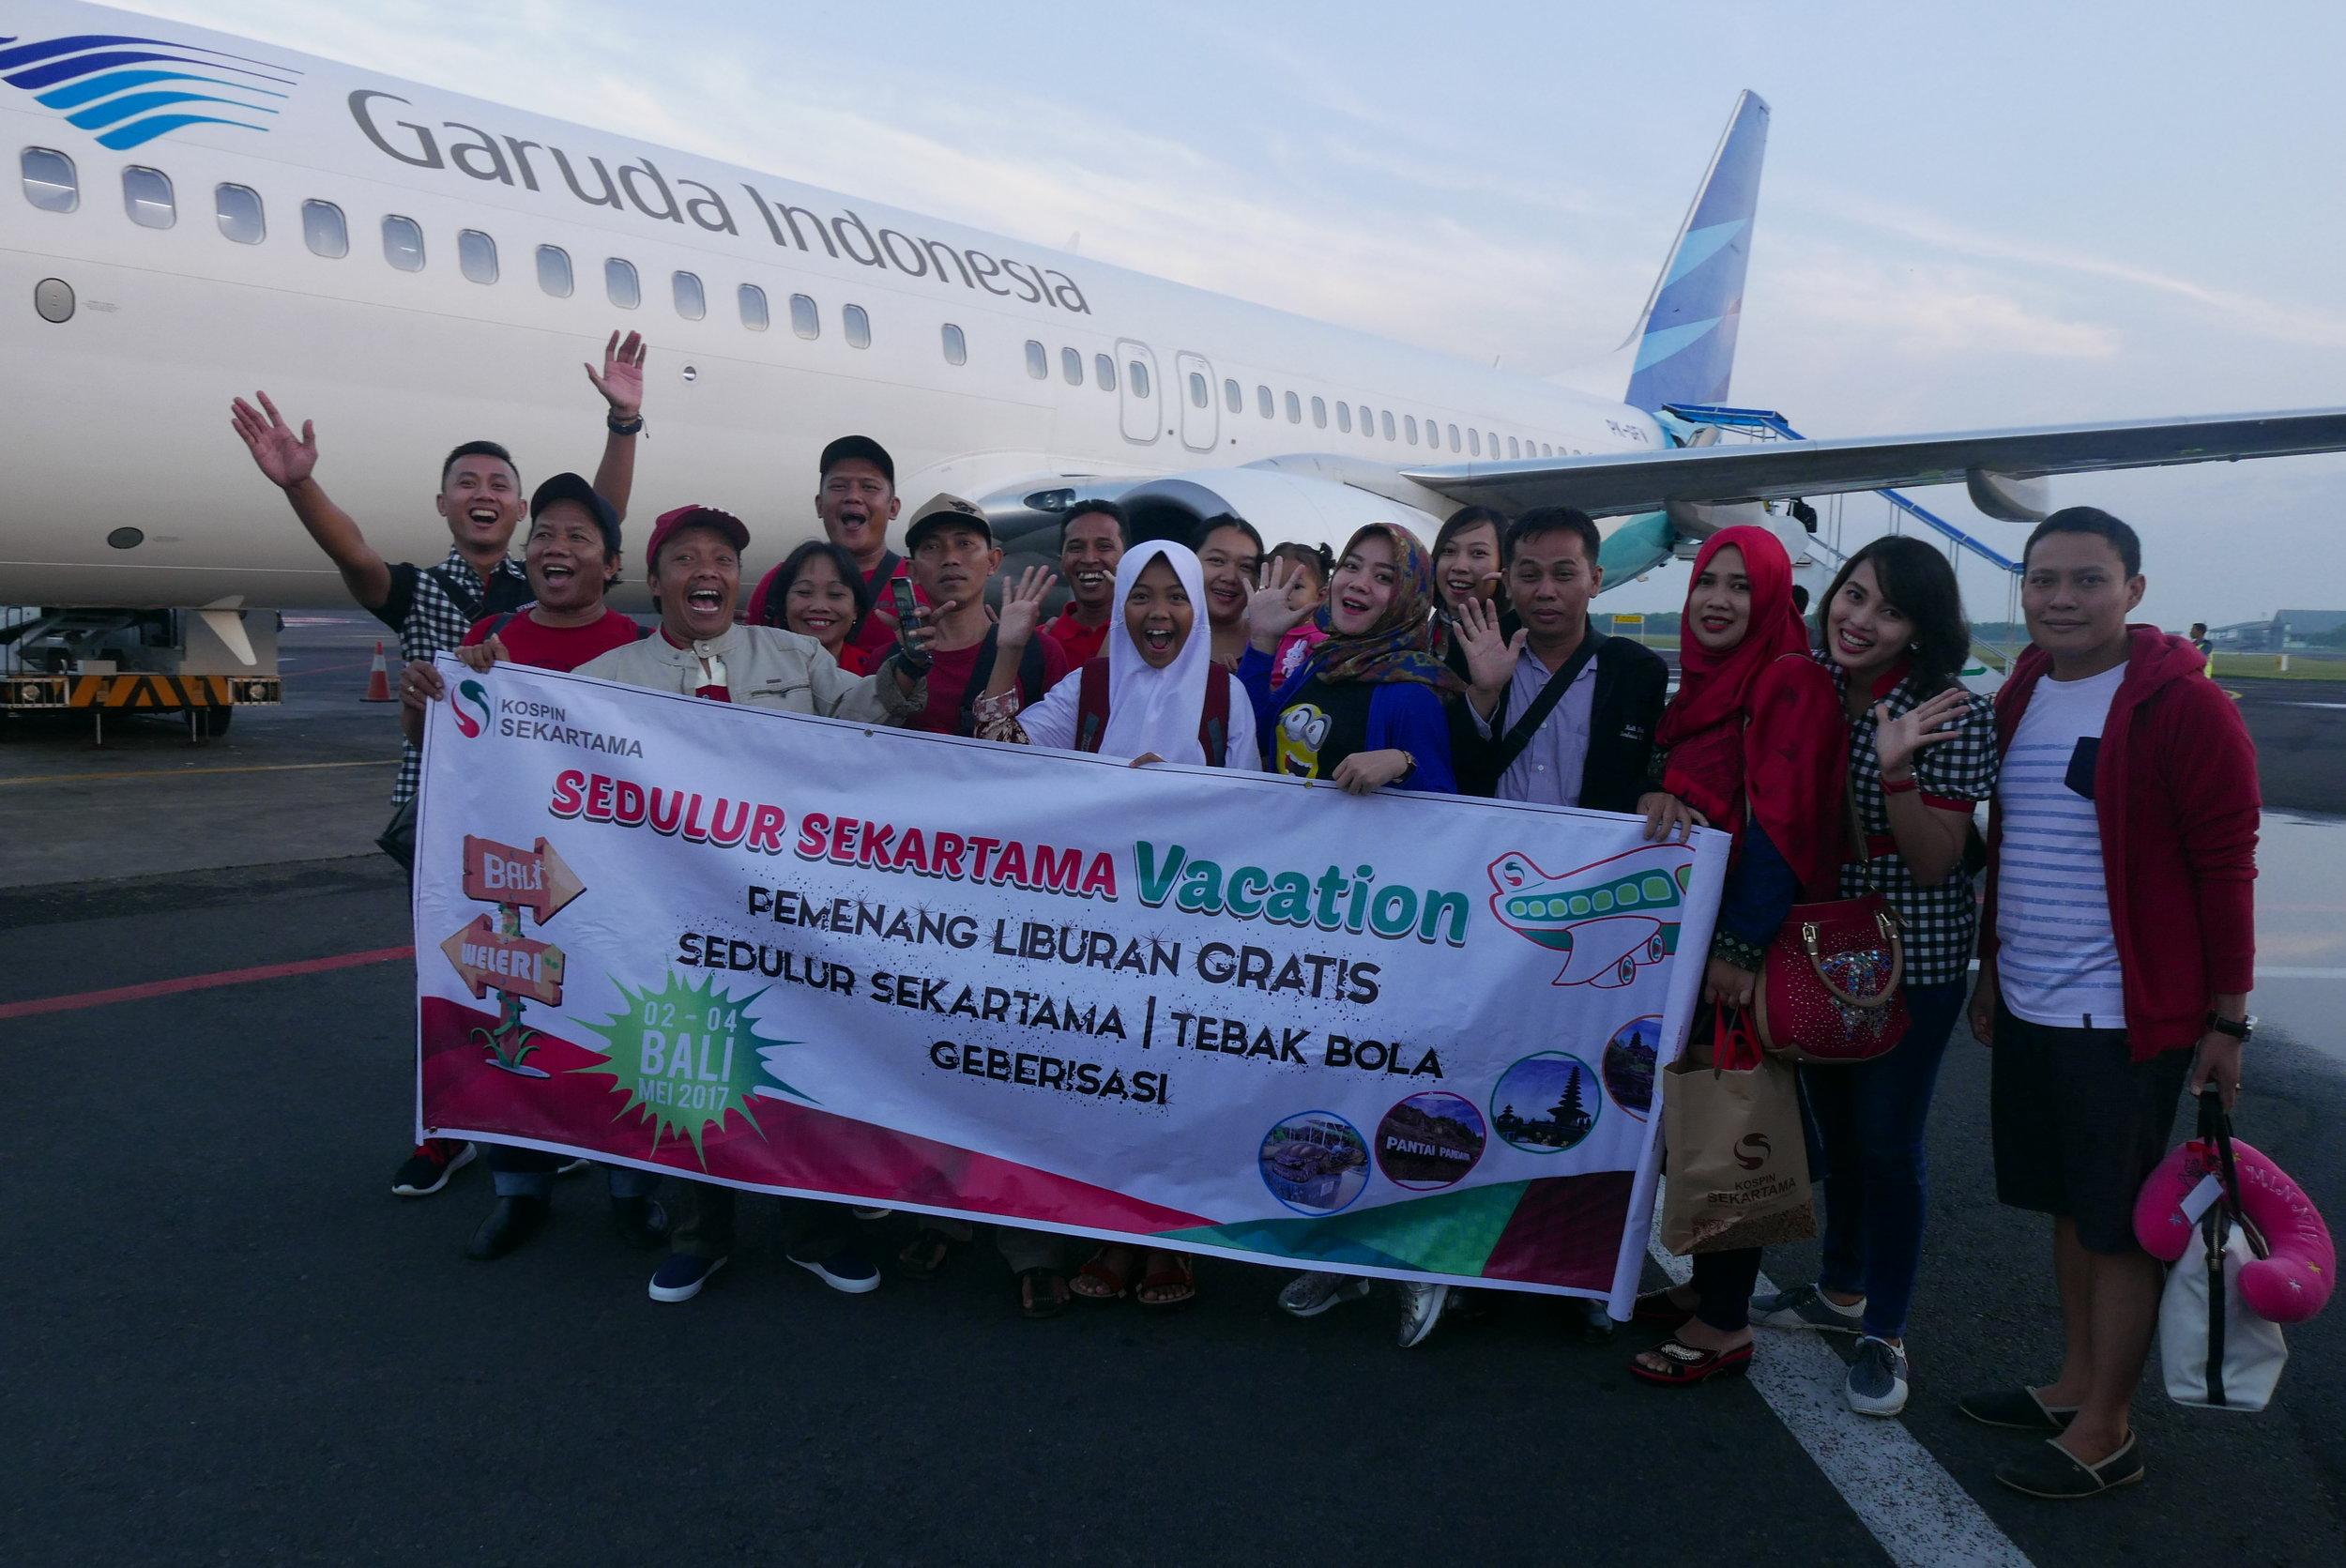 Peserta Liburan Gratis ke Bali berfoto bersama,sesaat sebelum lepas landas menuju pulau Dewata Bali, di bandara Ahmad Yani - Semarang 2 Mai 2017 (dok.istimewa)